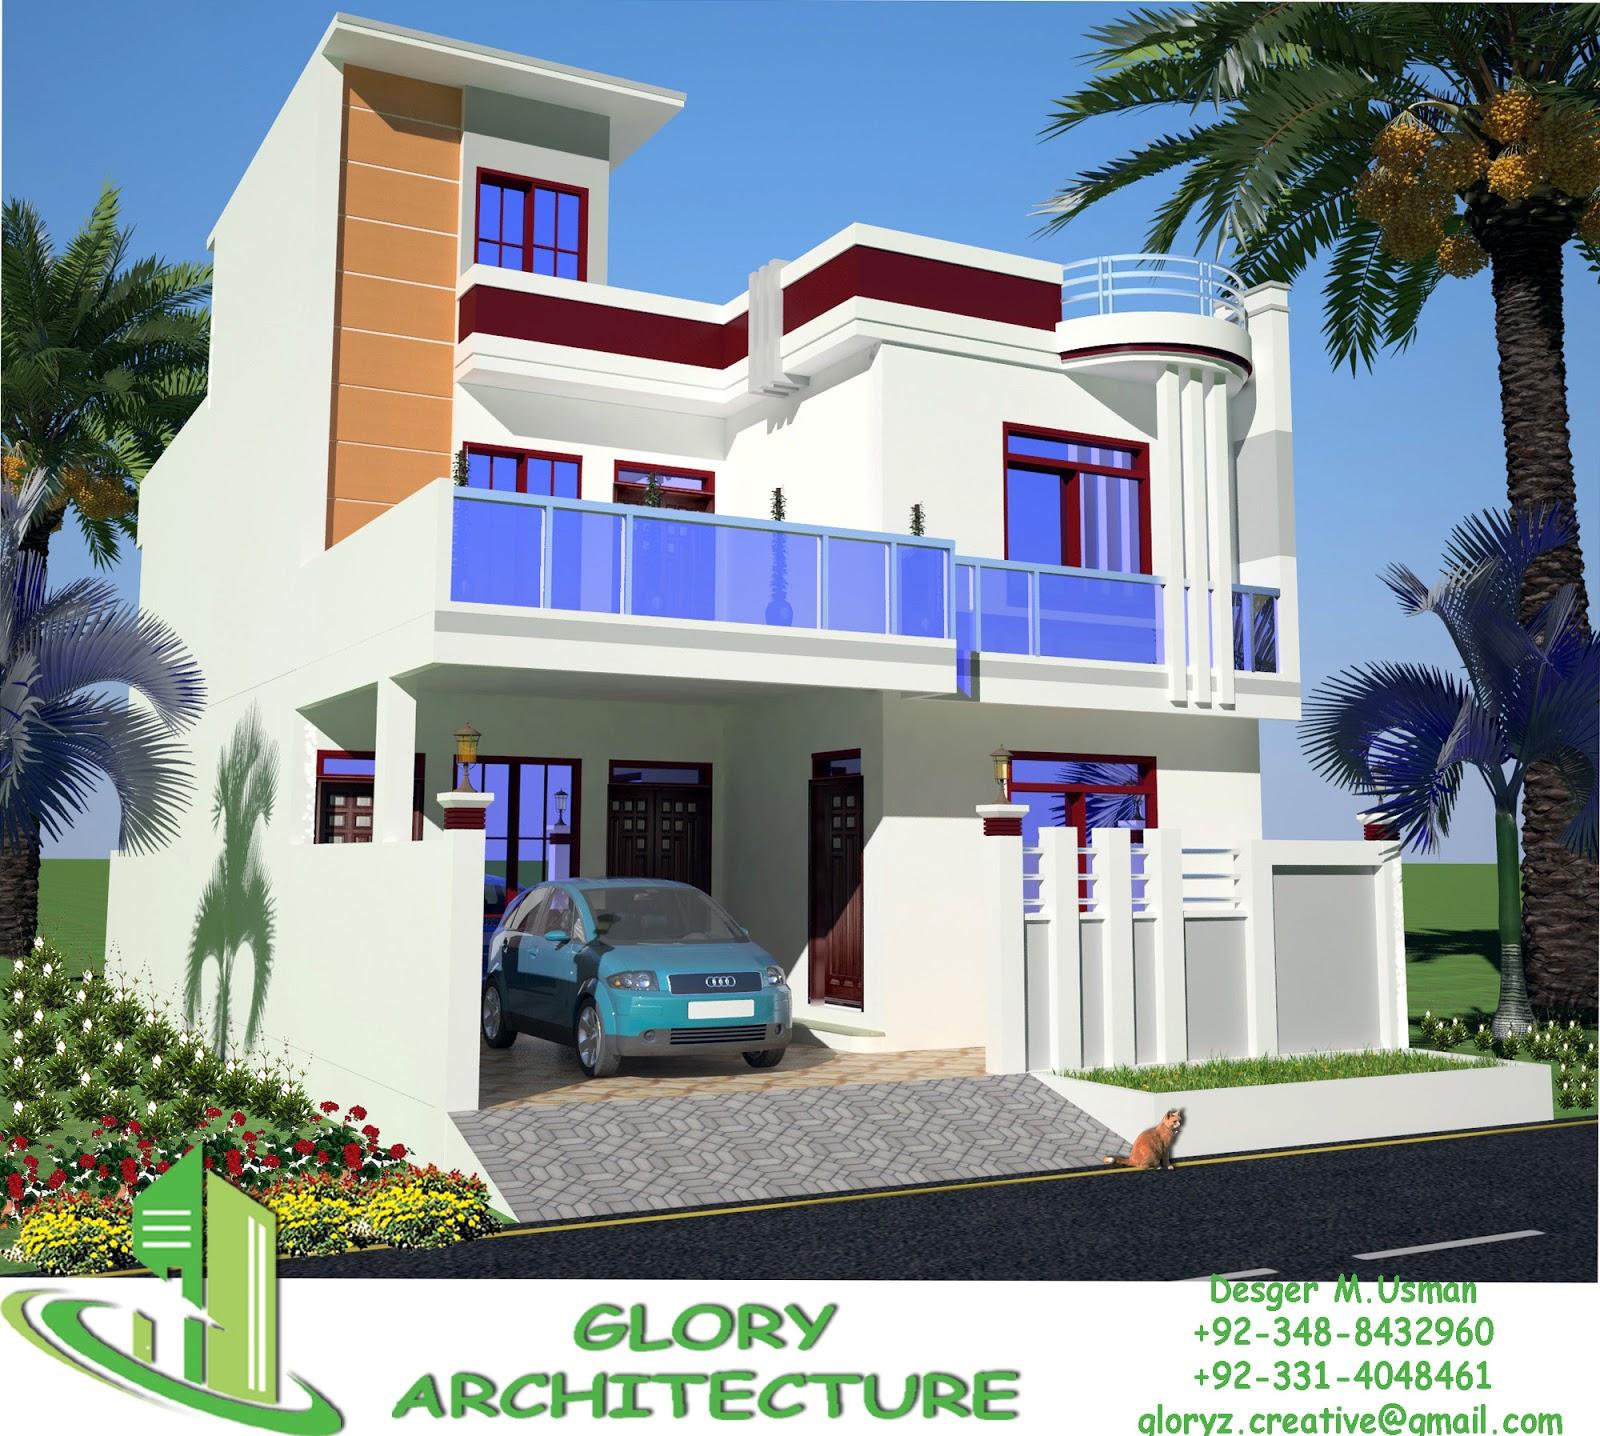 Icymi small home interior design photos calsclassic pinterest house dan also rh